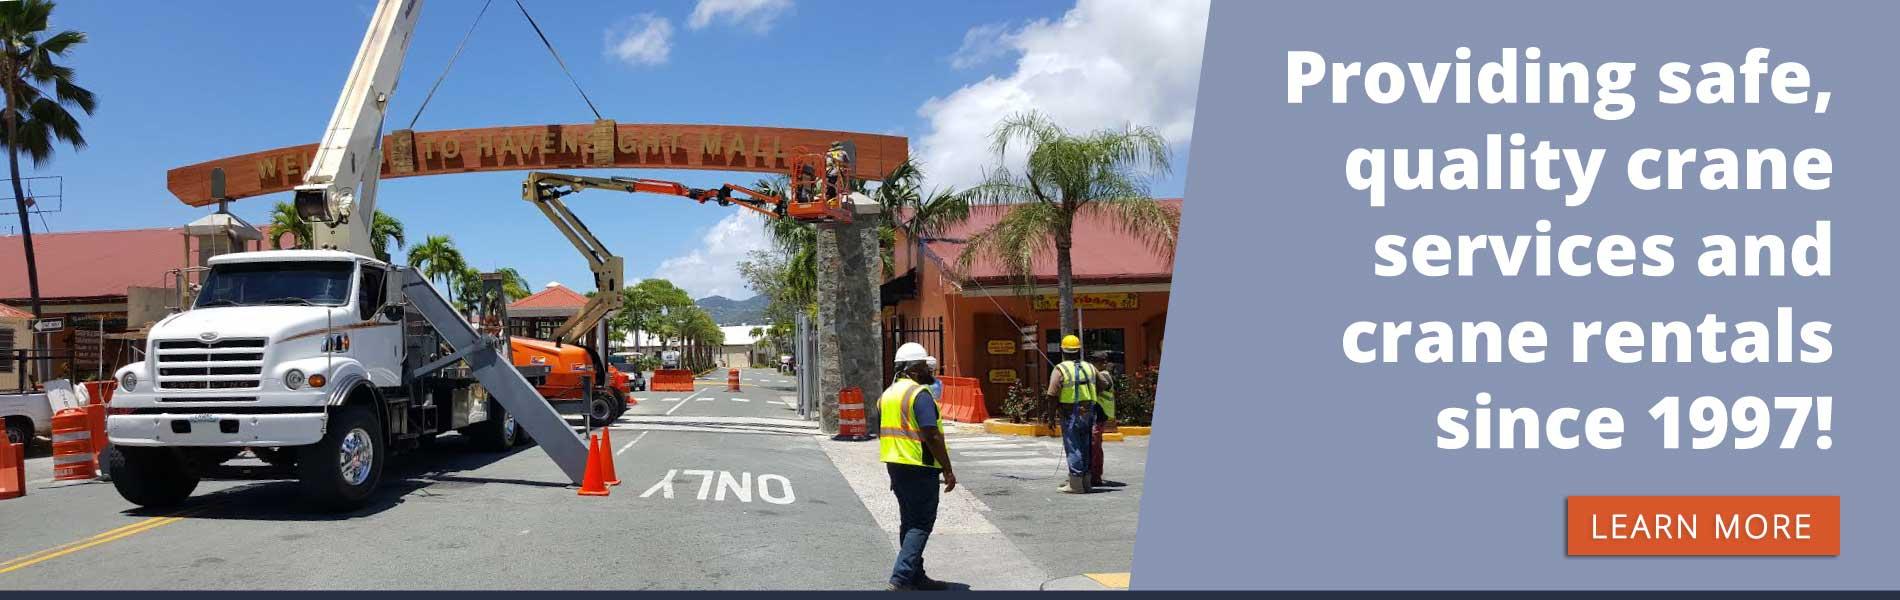 Crane Service and Rental Company in St  Thomas, VI